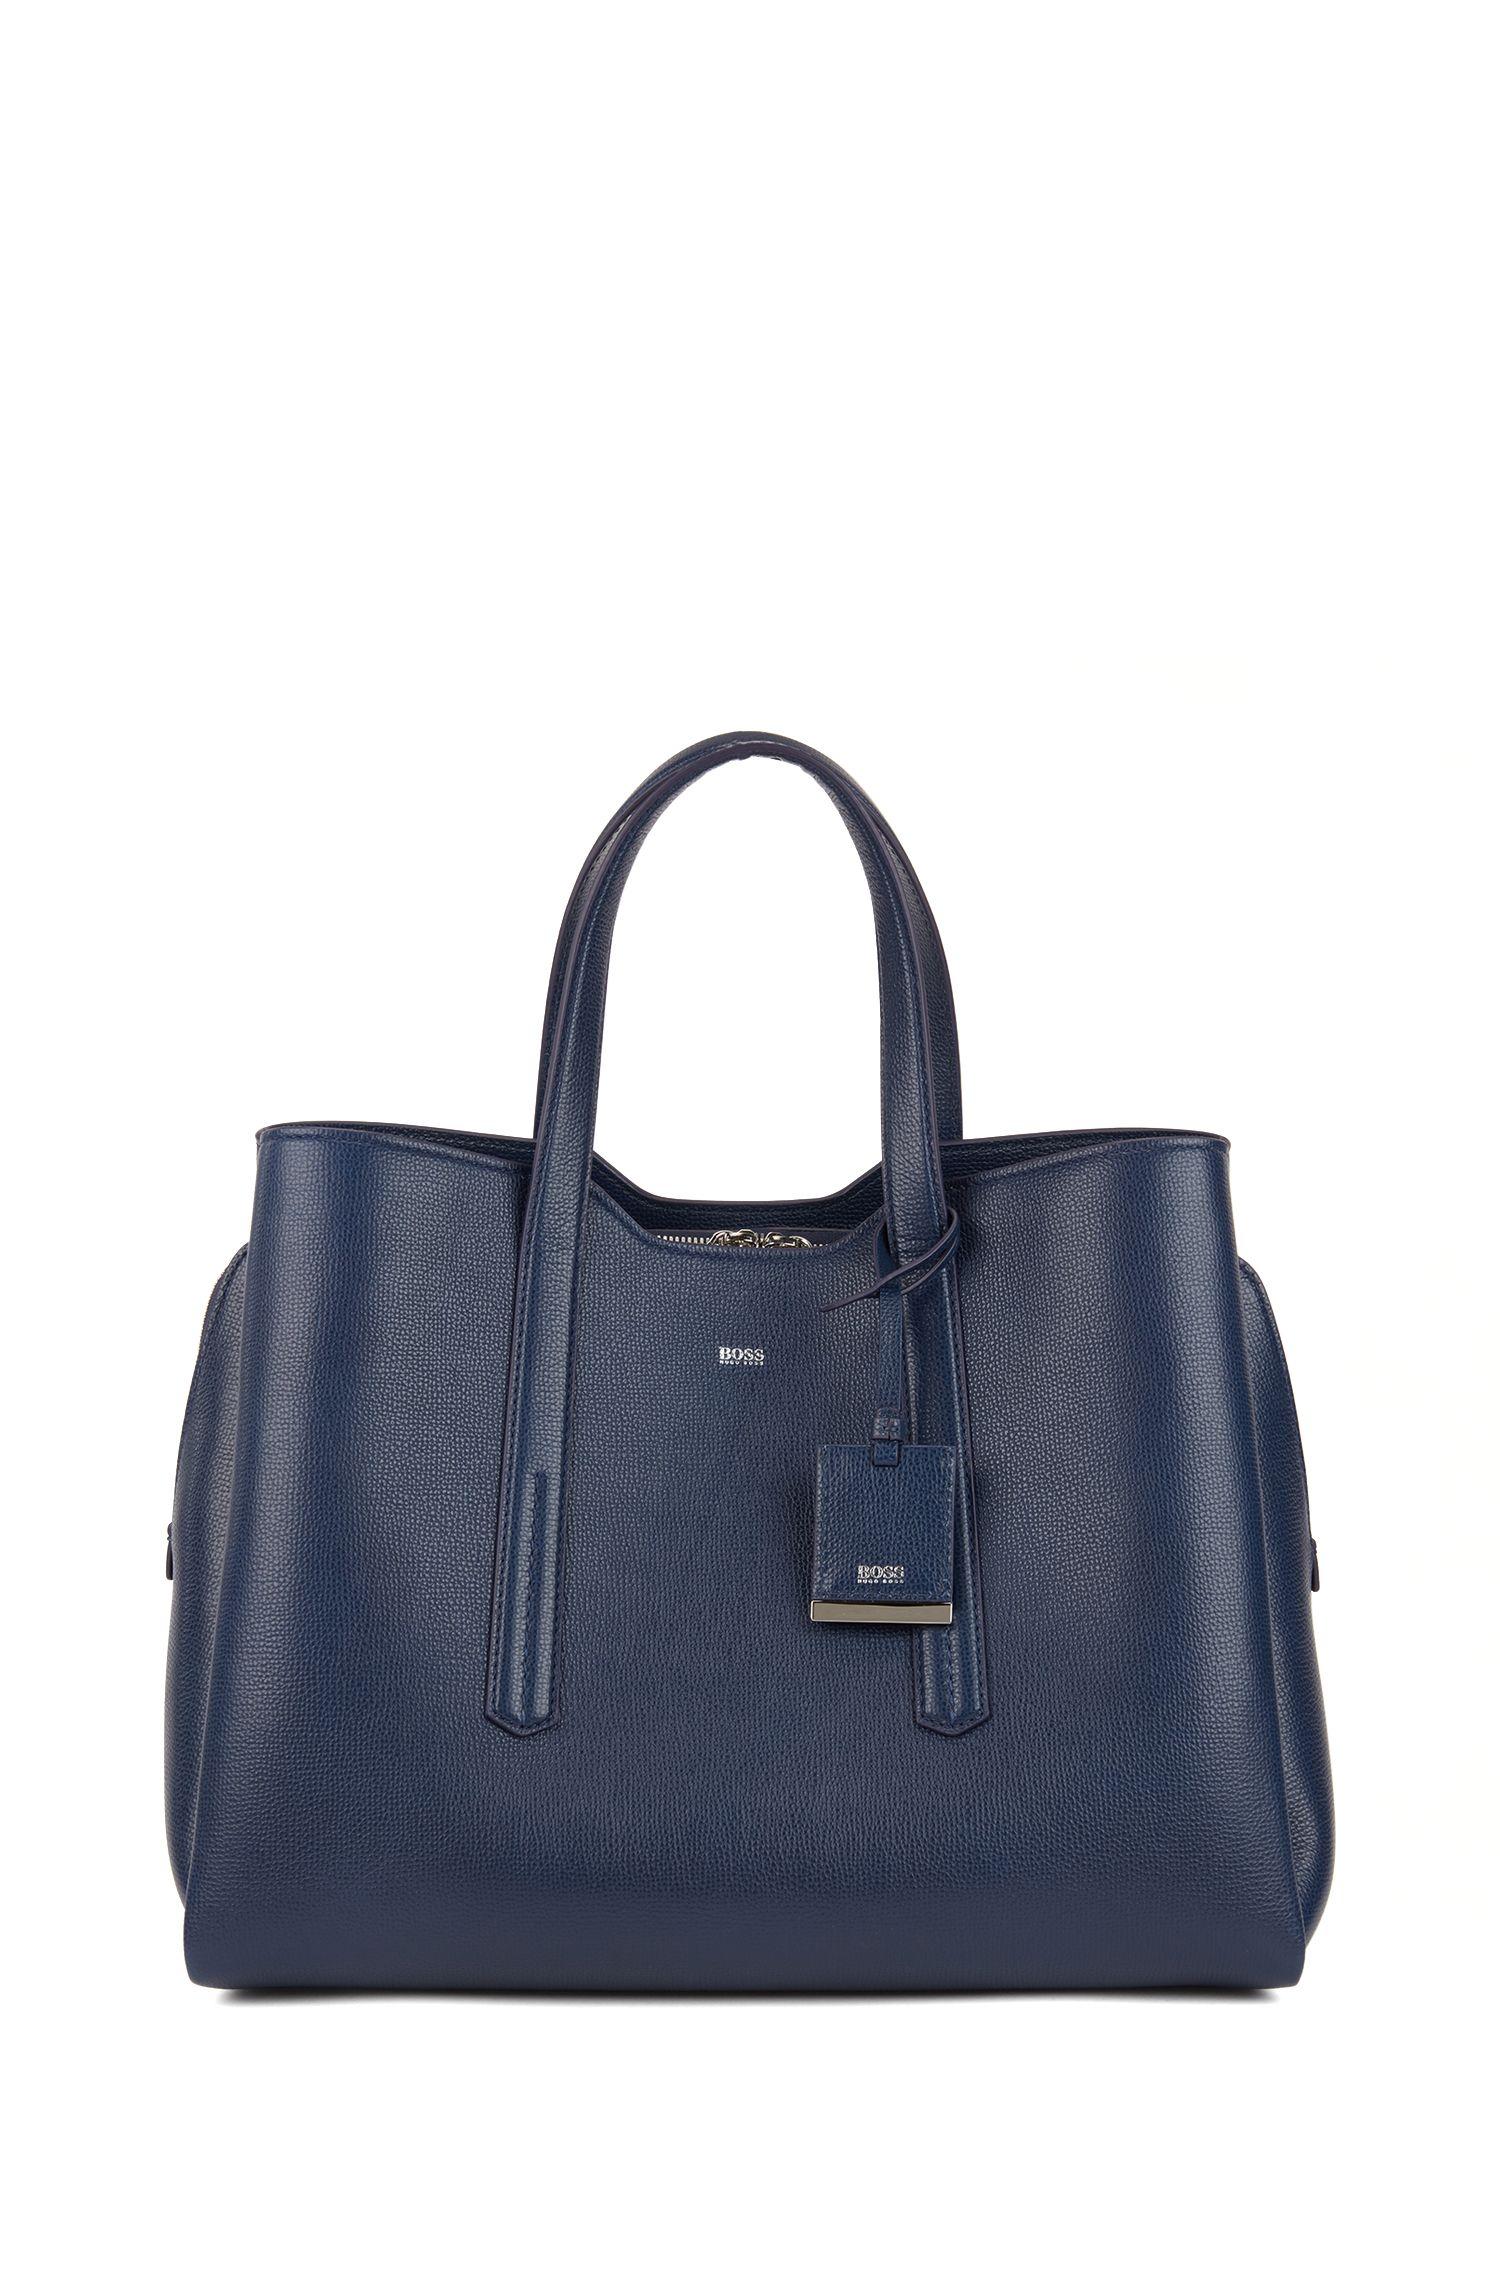 Softe Tote Bag aus genarbtem italienischem Leder, Hellblau